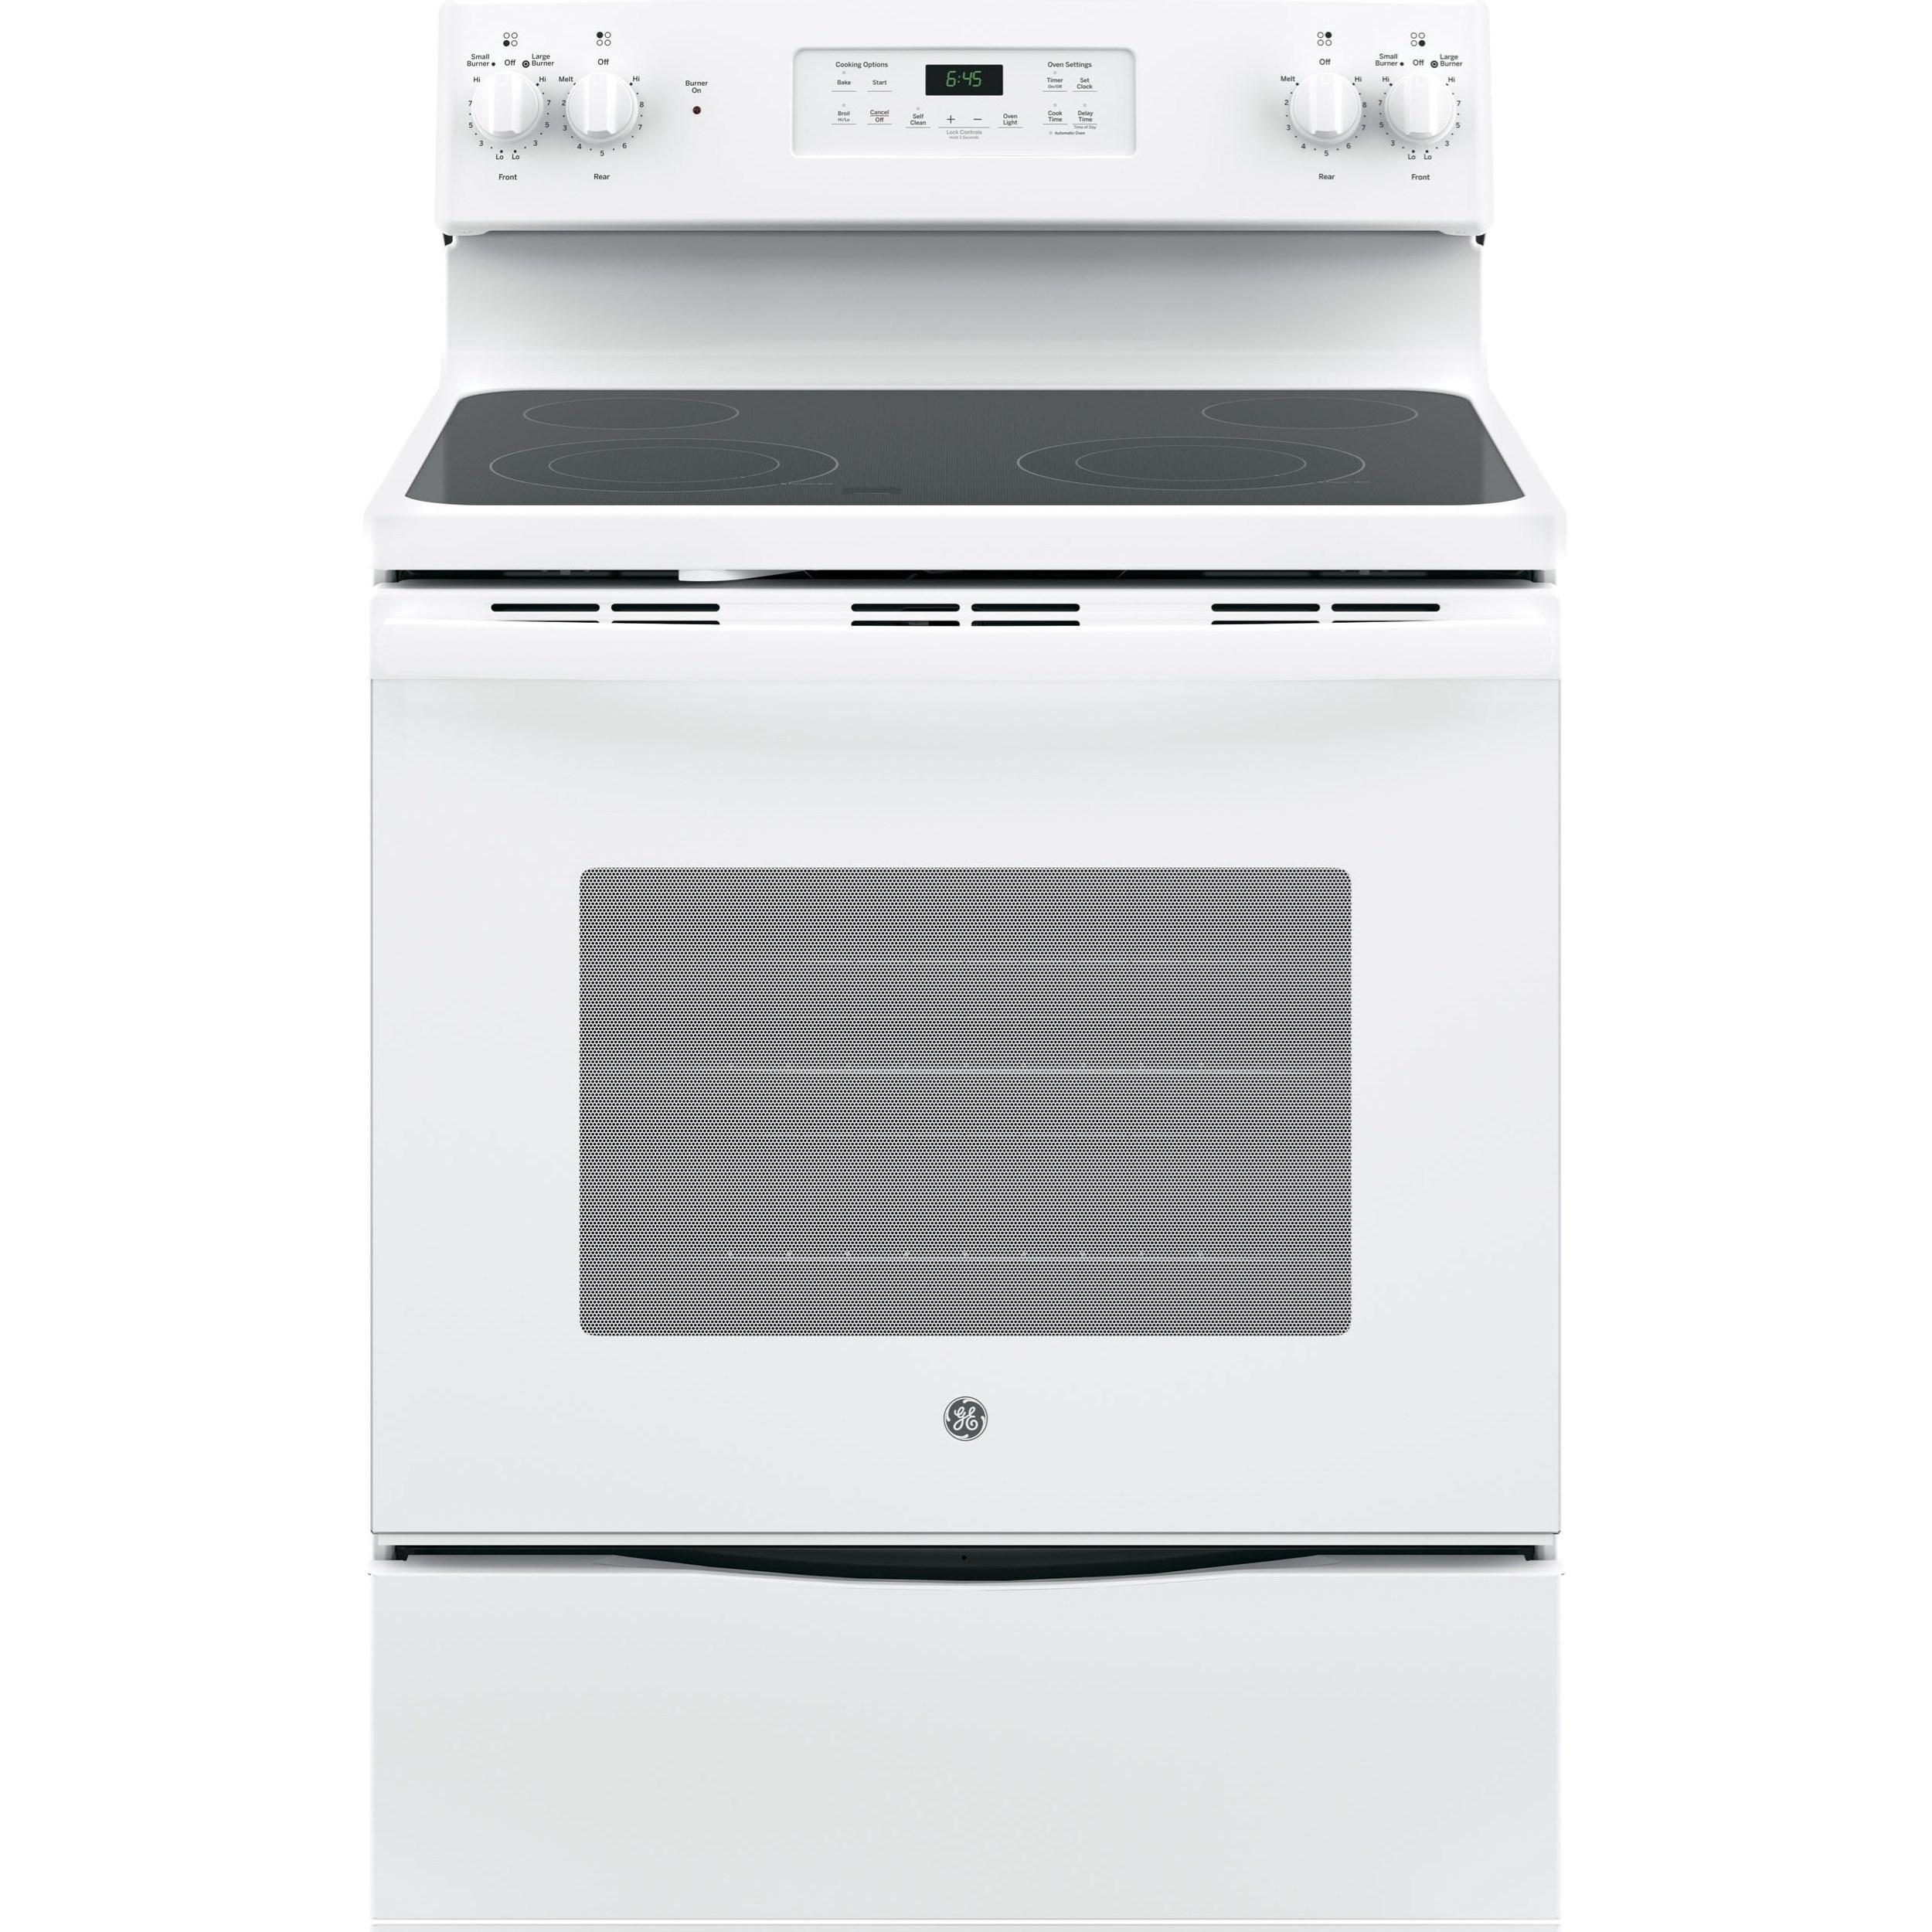 "GE Appliances GE Electric Ranges 30"" Free-Standing Electric Range - Item Number: JB645DKWW"